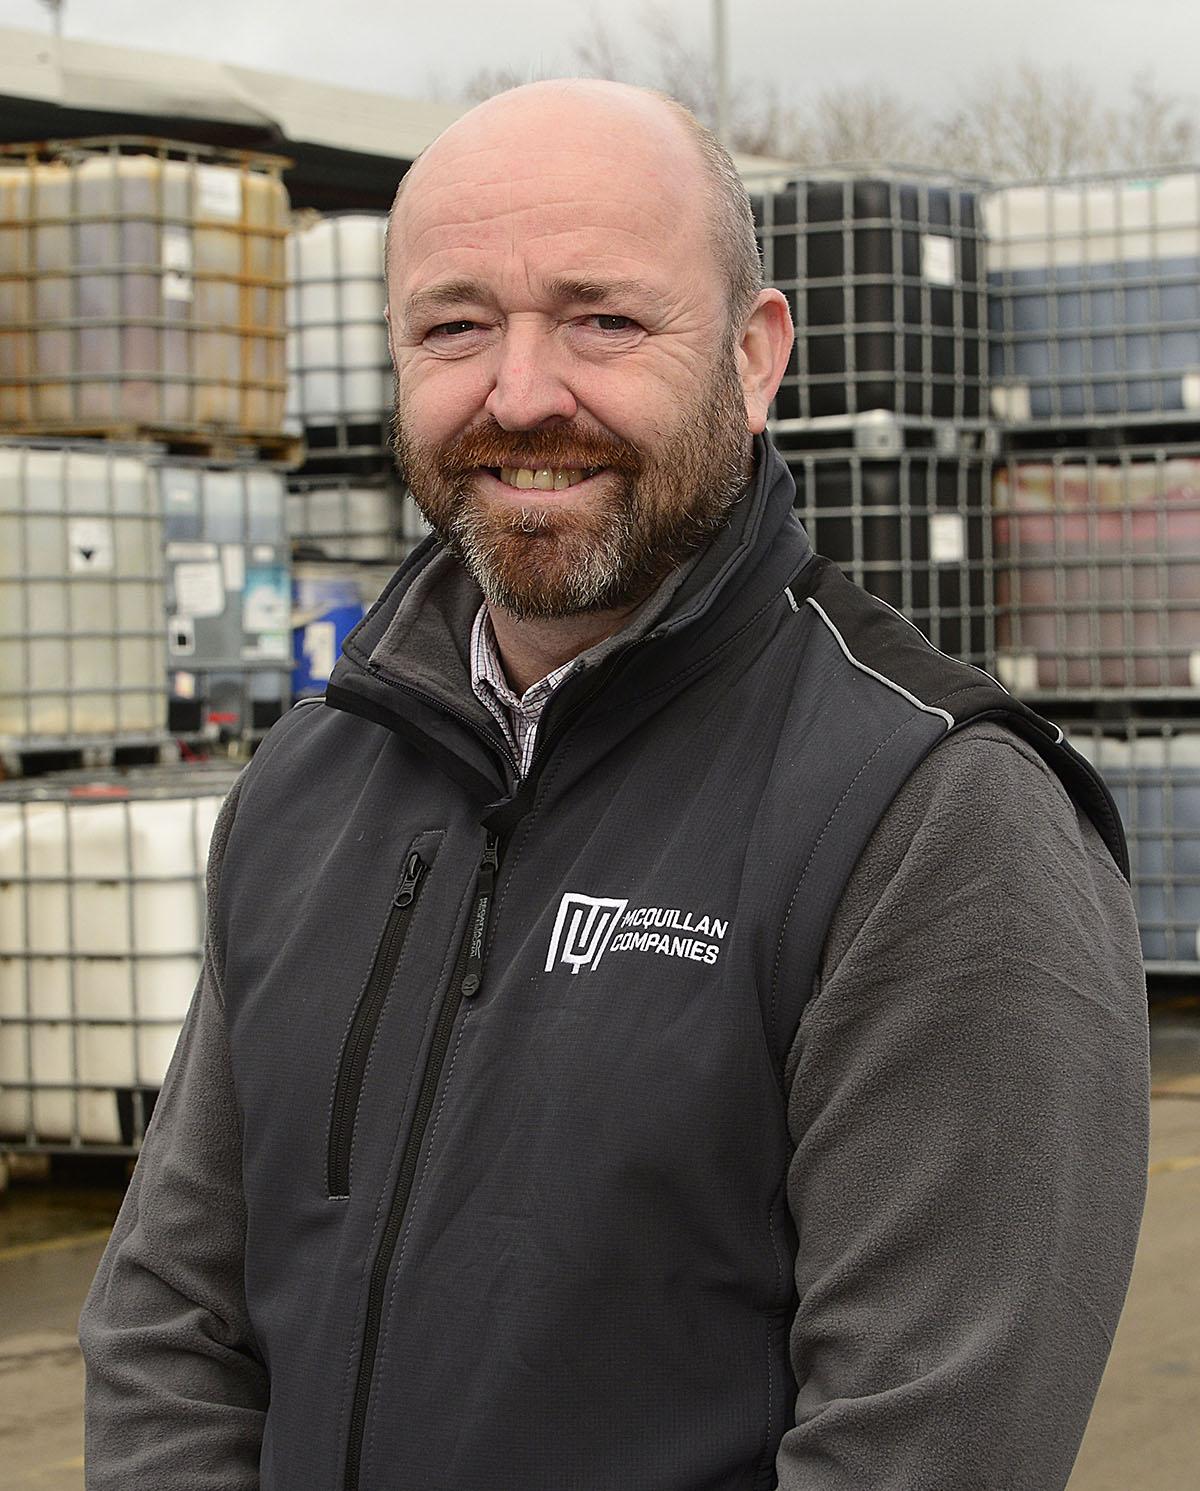 <strong><strong><strong>Neil McCauley MCIWM, Chair – Northern Ireland CIWM Centre Council</strong></strong></strong>